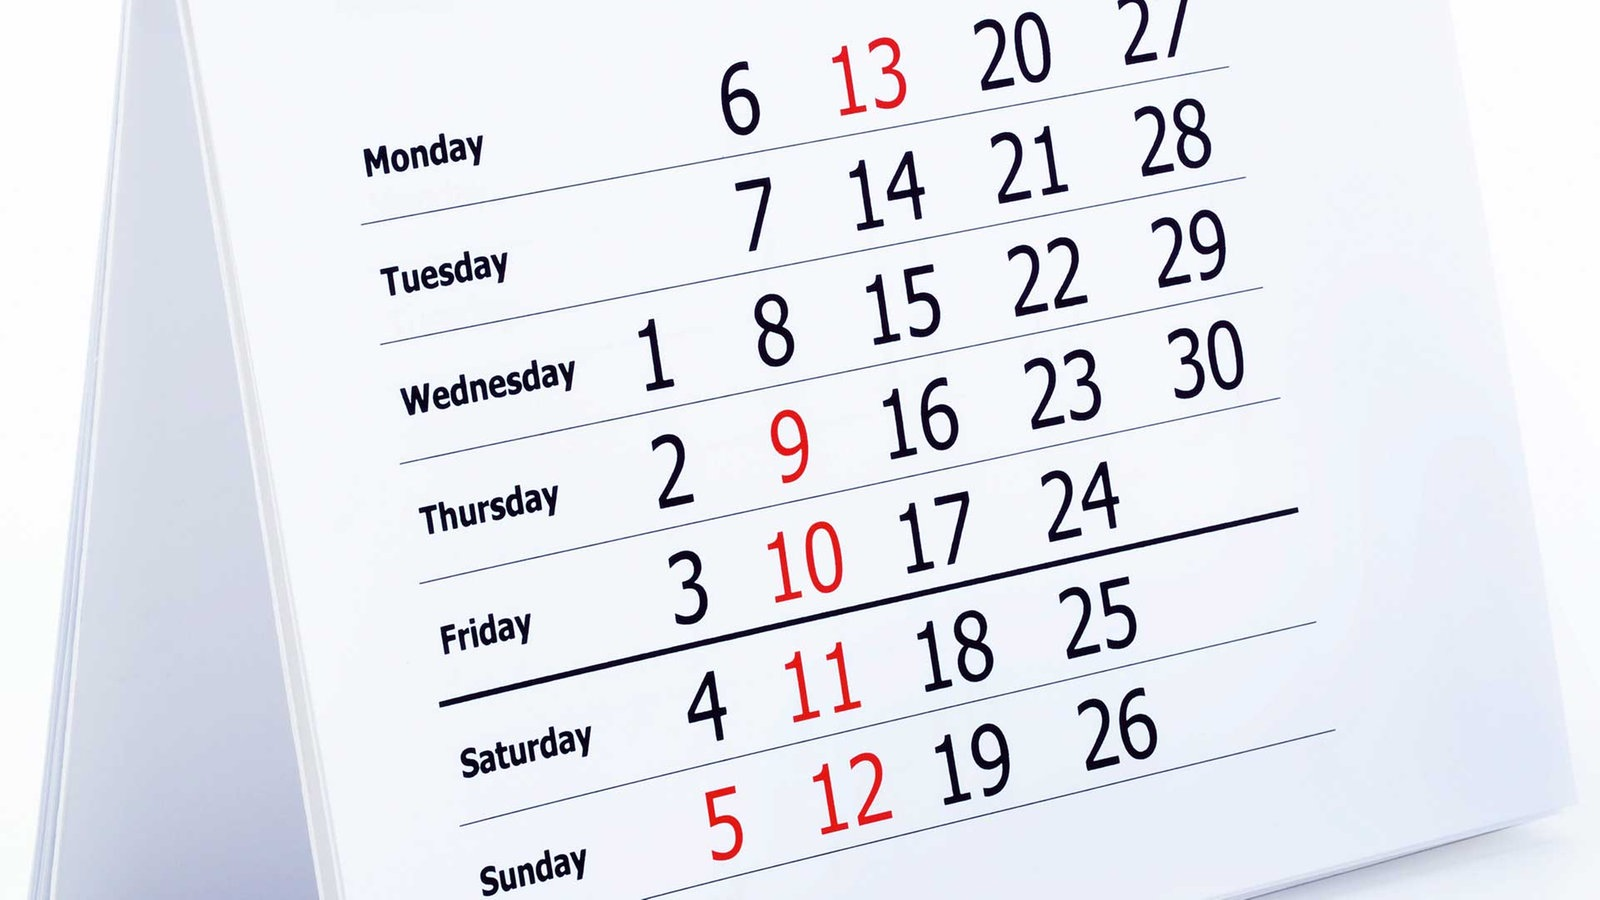 Ordnungssysteme: Kalender - Ordnungssysteme - Gesellschaft - Planet ...